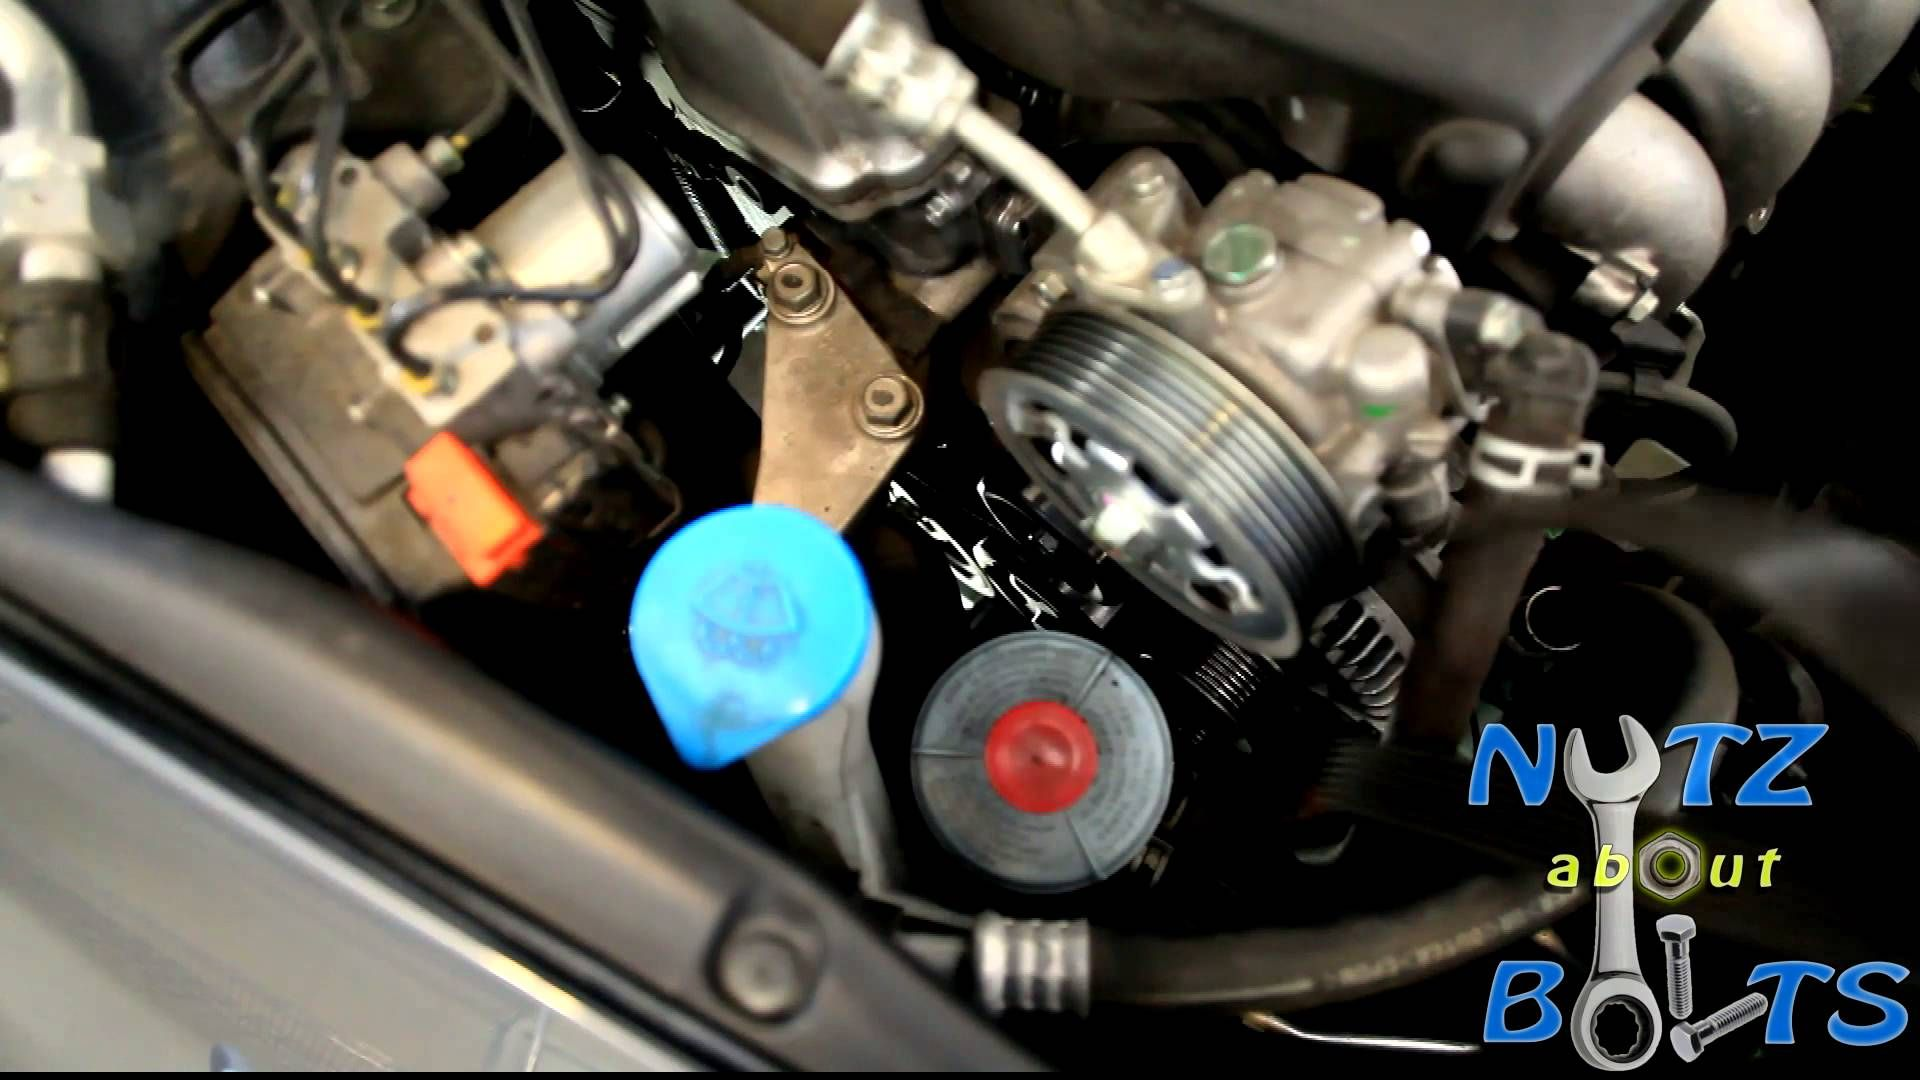 2003 2007 Honda Accord Serpentine Belt Replacement Car Alternator Honda Accord Alternator